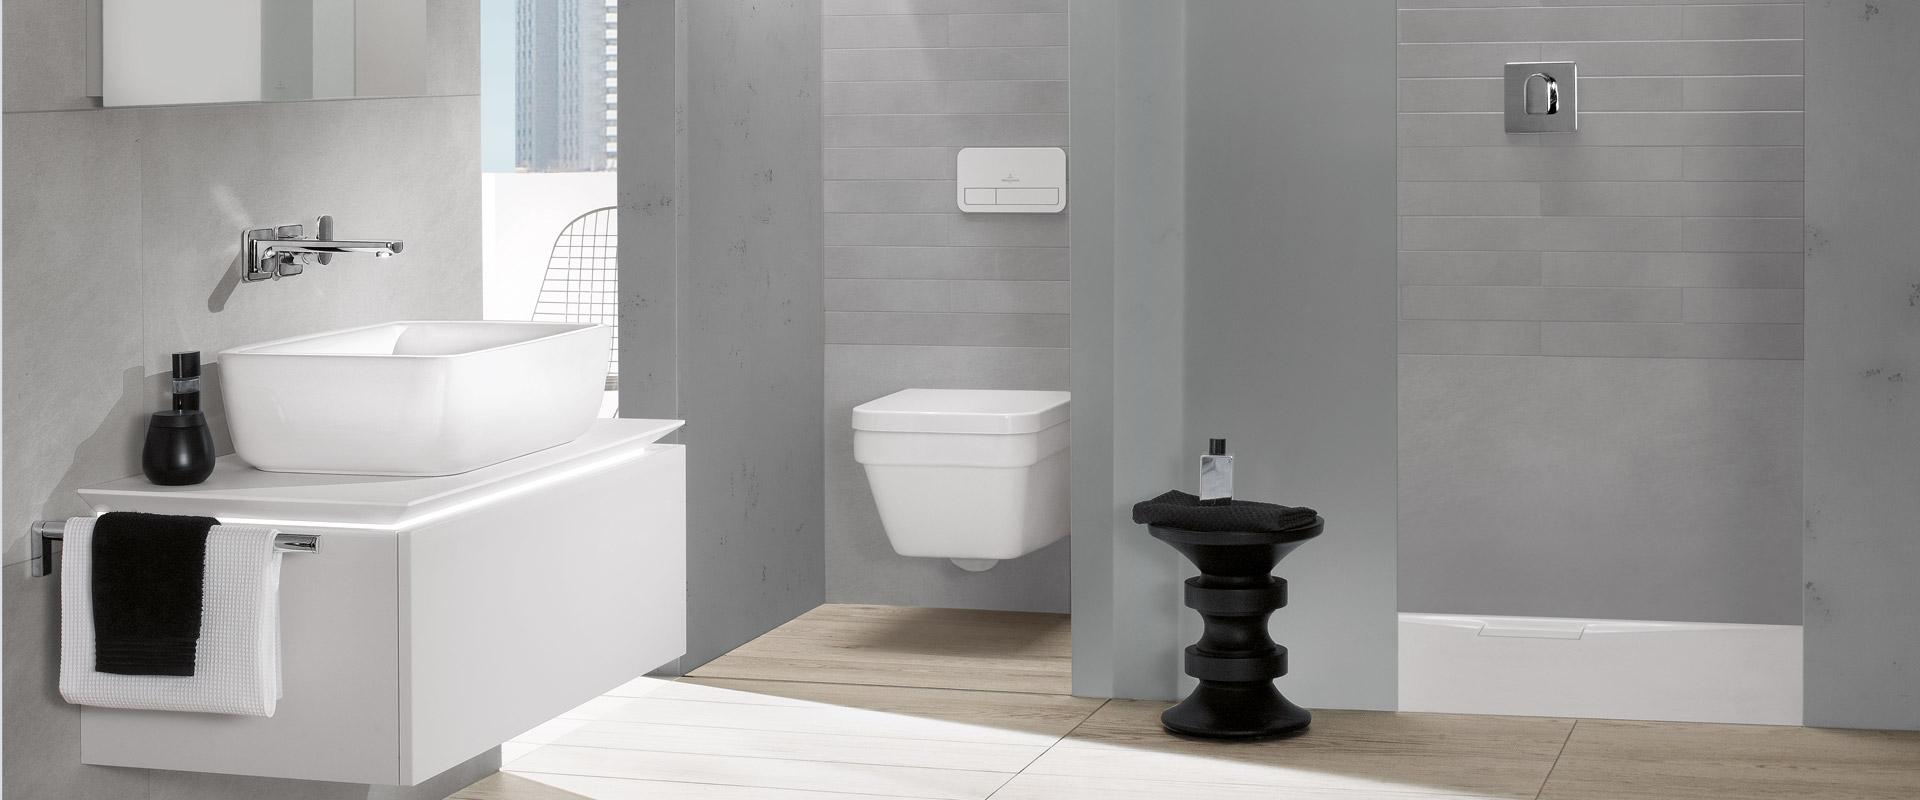 architectura cer - Bathroom Designs Villeroy And Boch